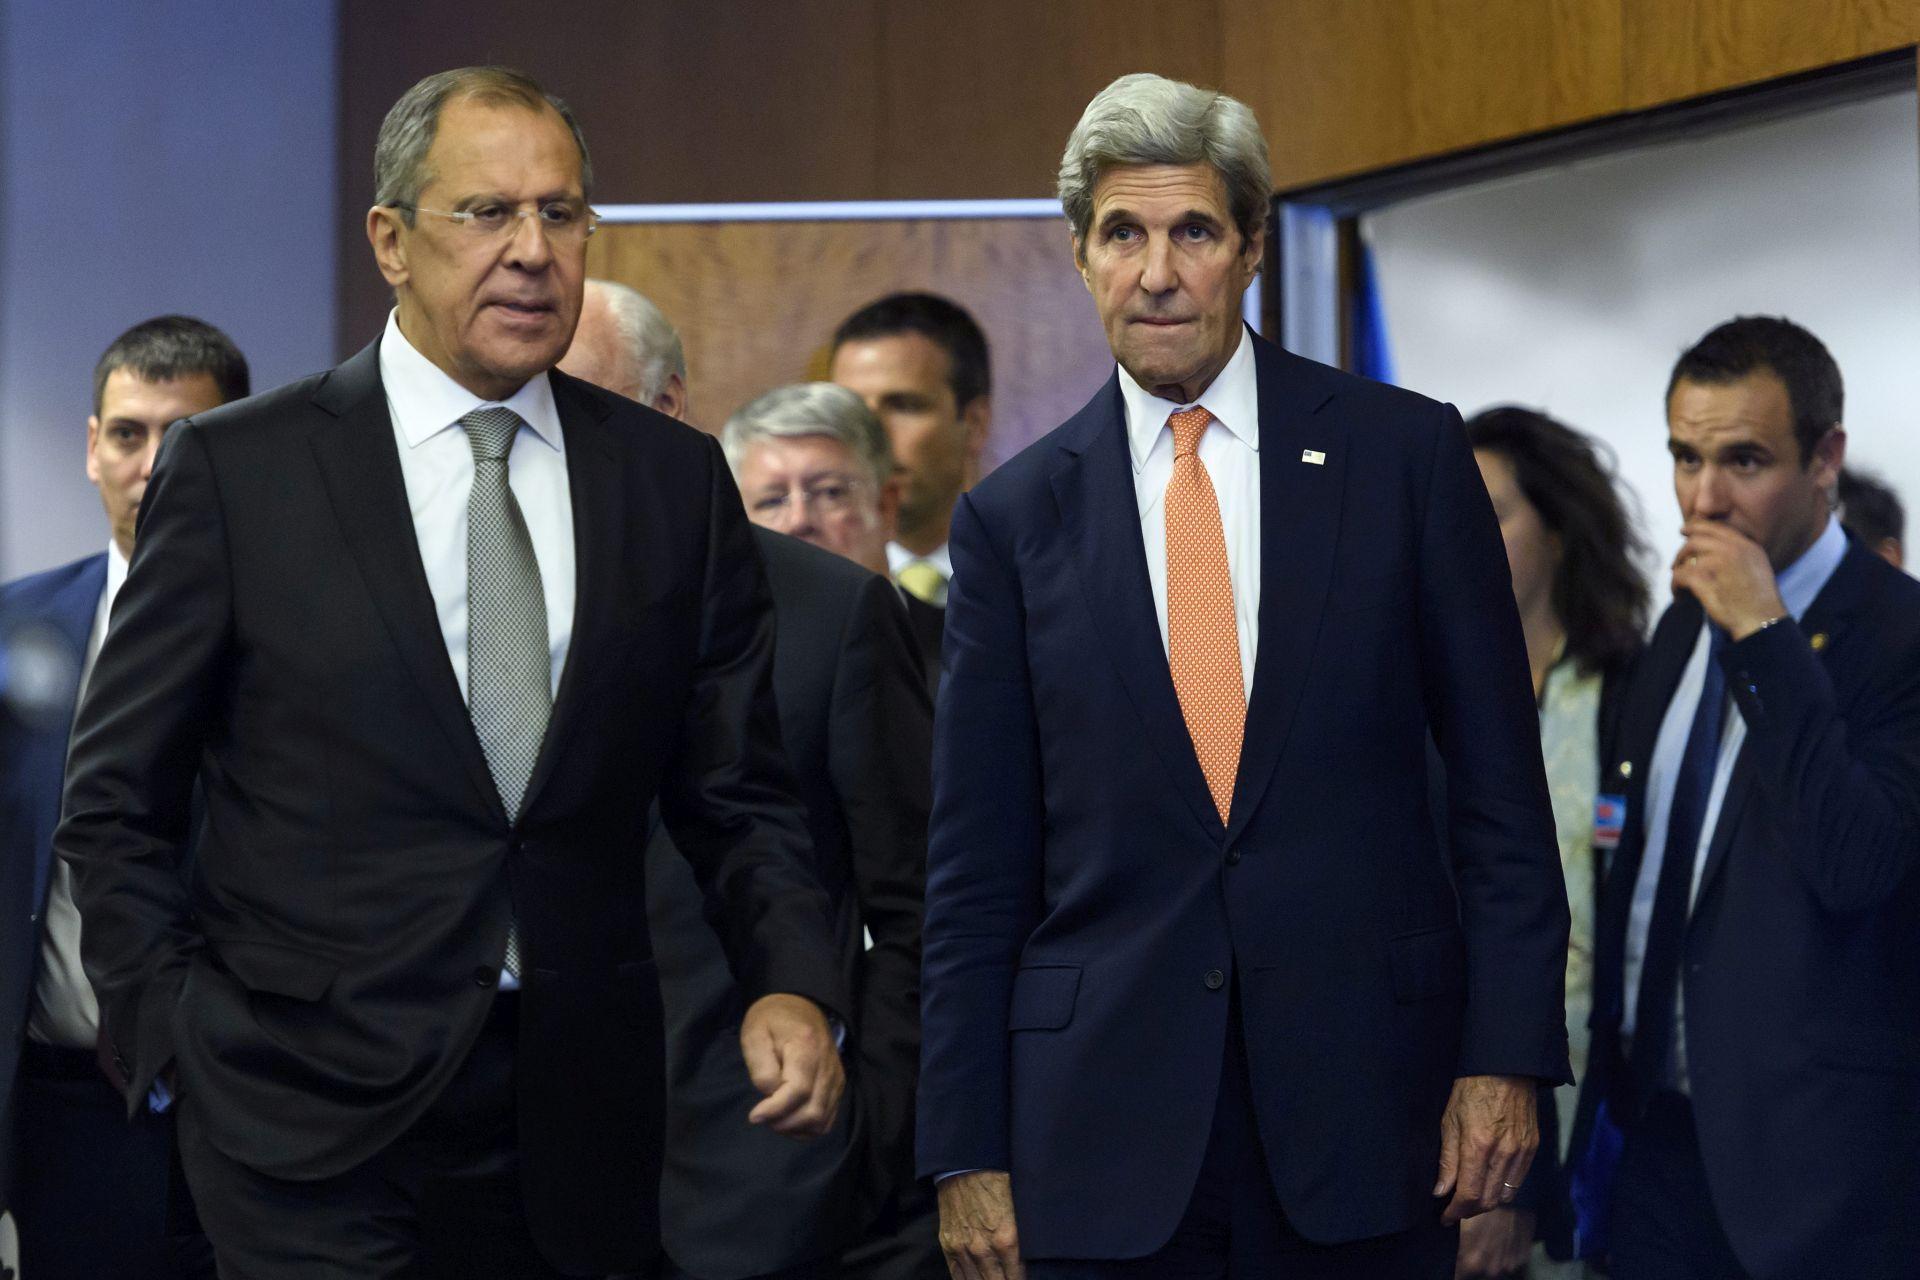 SAD suspendirao pregovore s Rusijom o prekidu vatre u Siriji